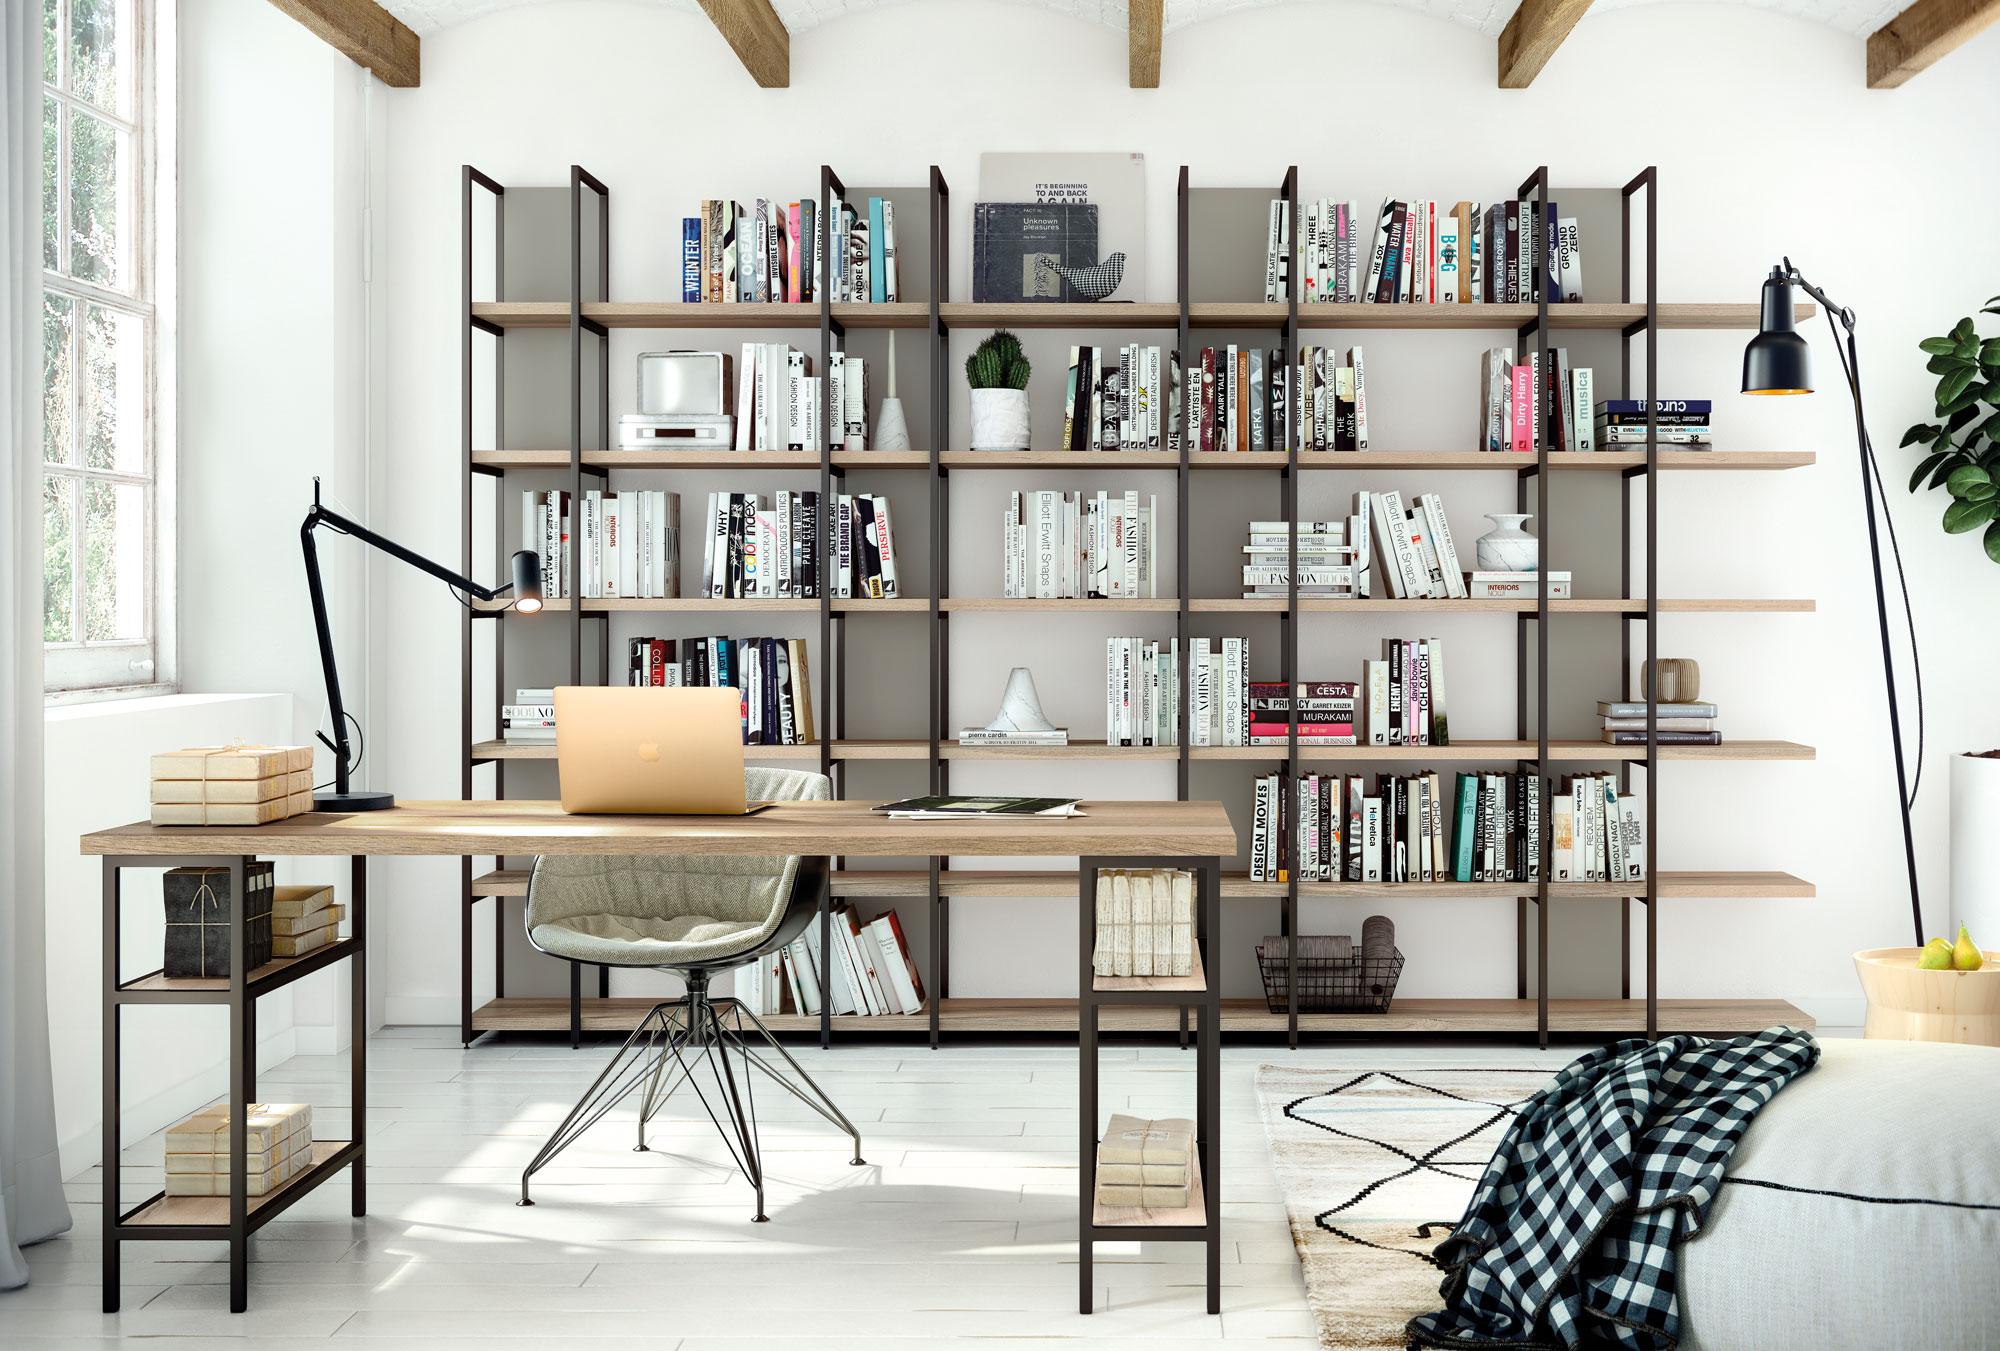 far-mobili-arredamenti-blog-smart-workingorgosesia-vercelli-blof